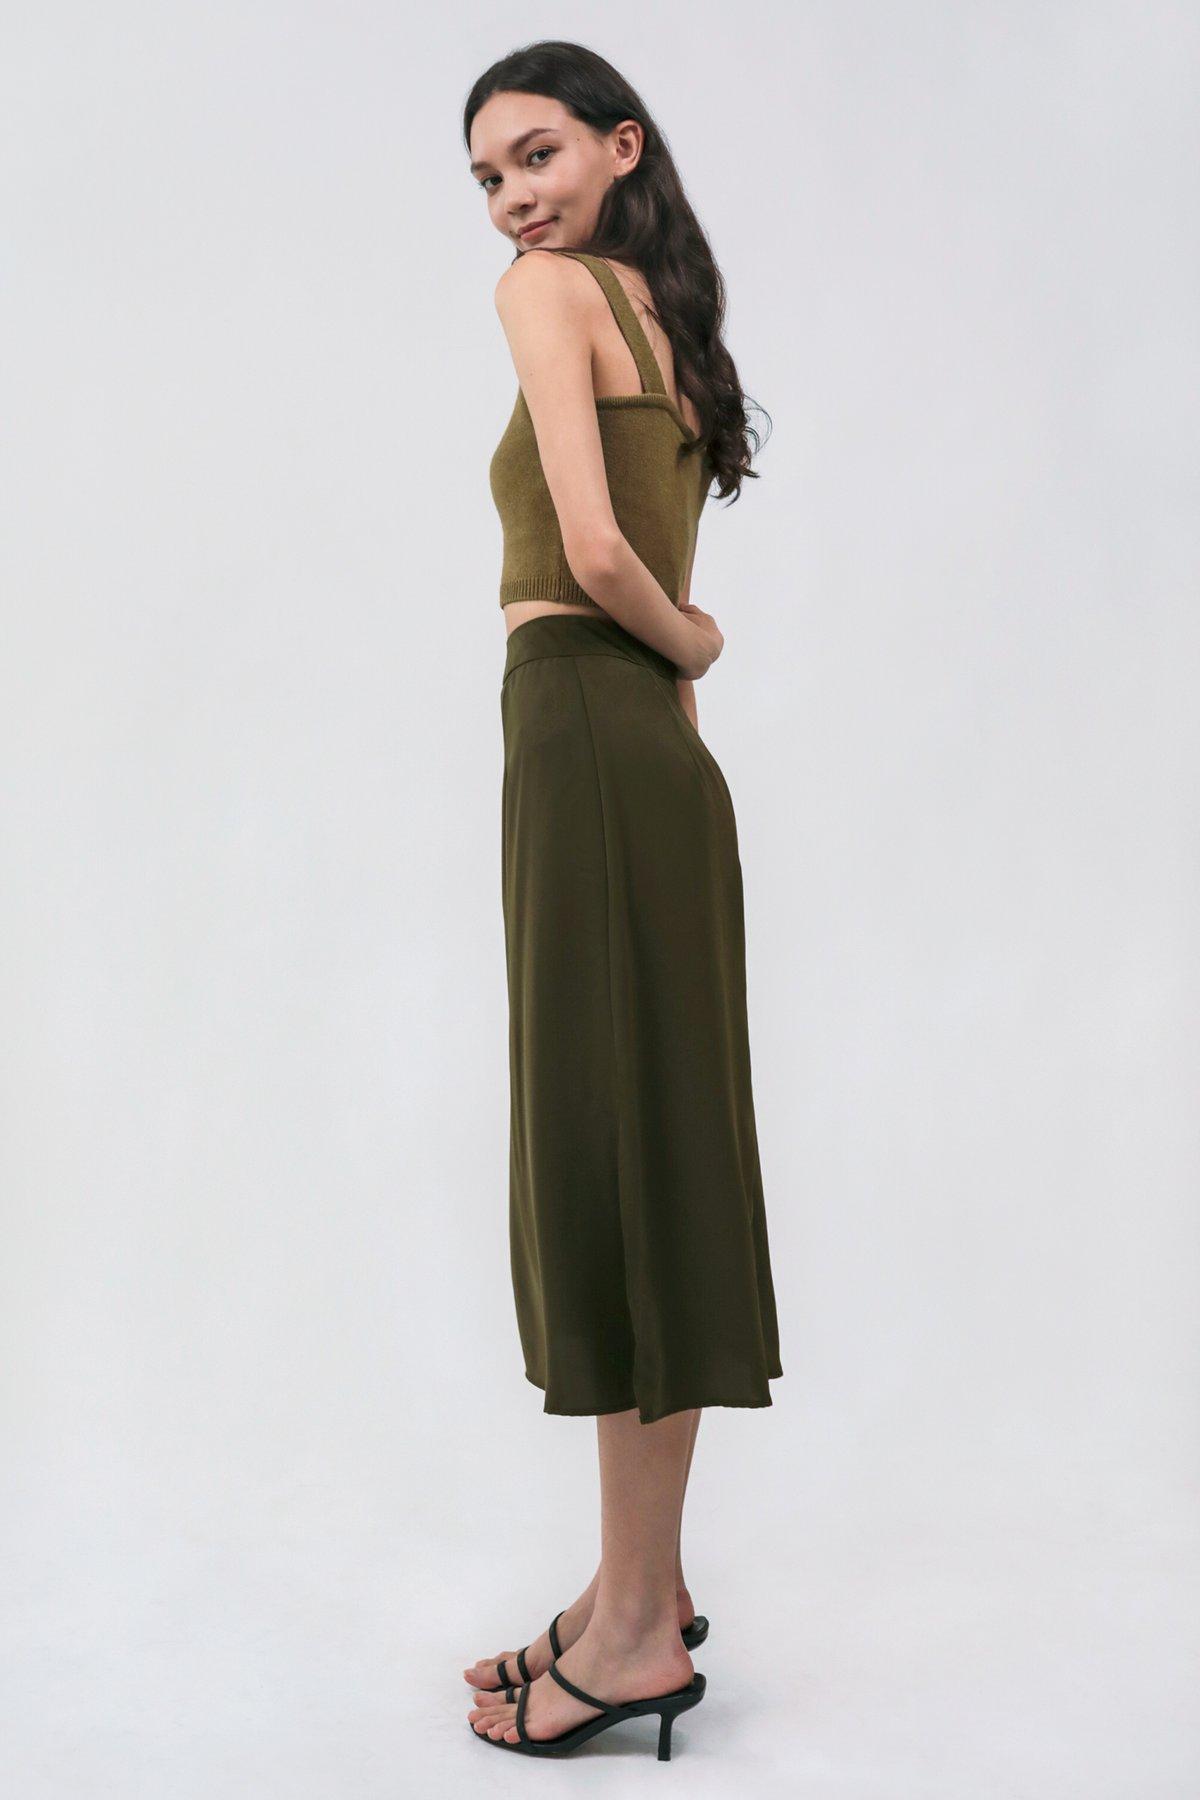 Arley Knit Bralet (Moss)